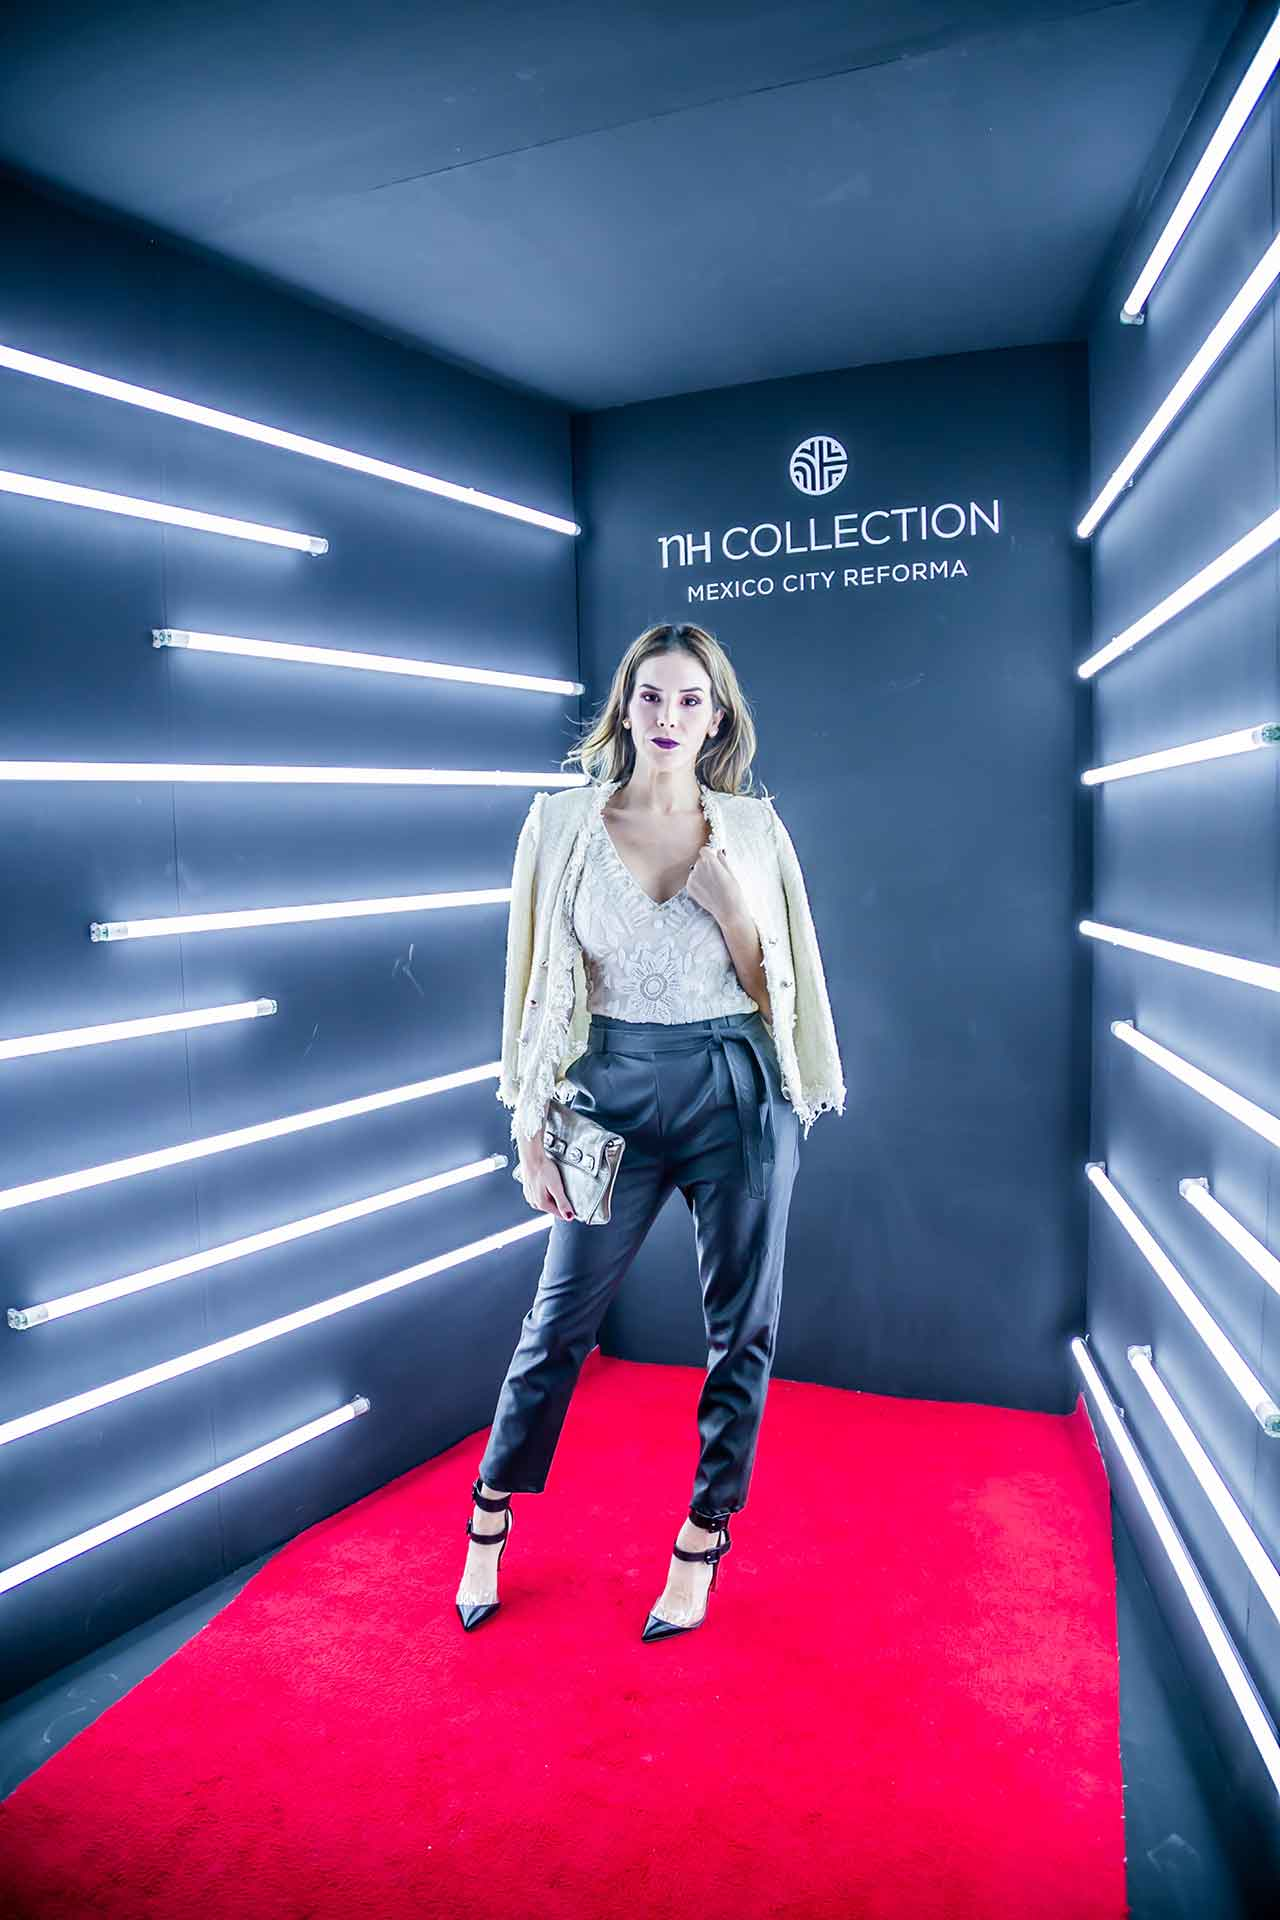 NH Collection Mexico City Reforma